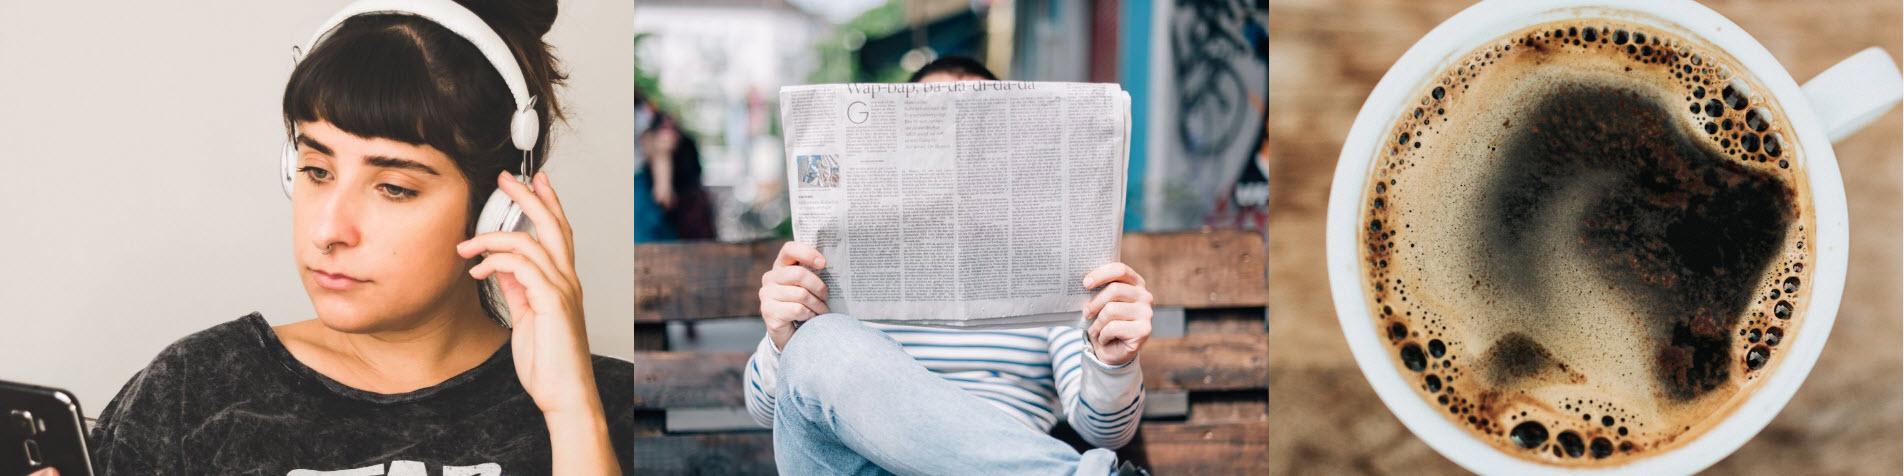 Opinionsbildning i talmedia